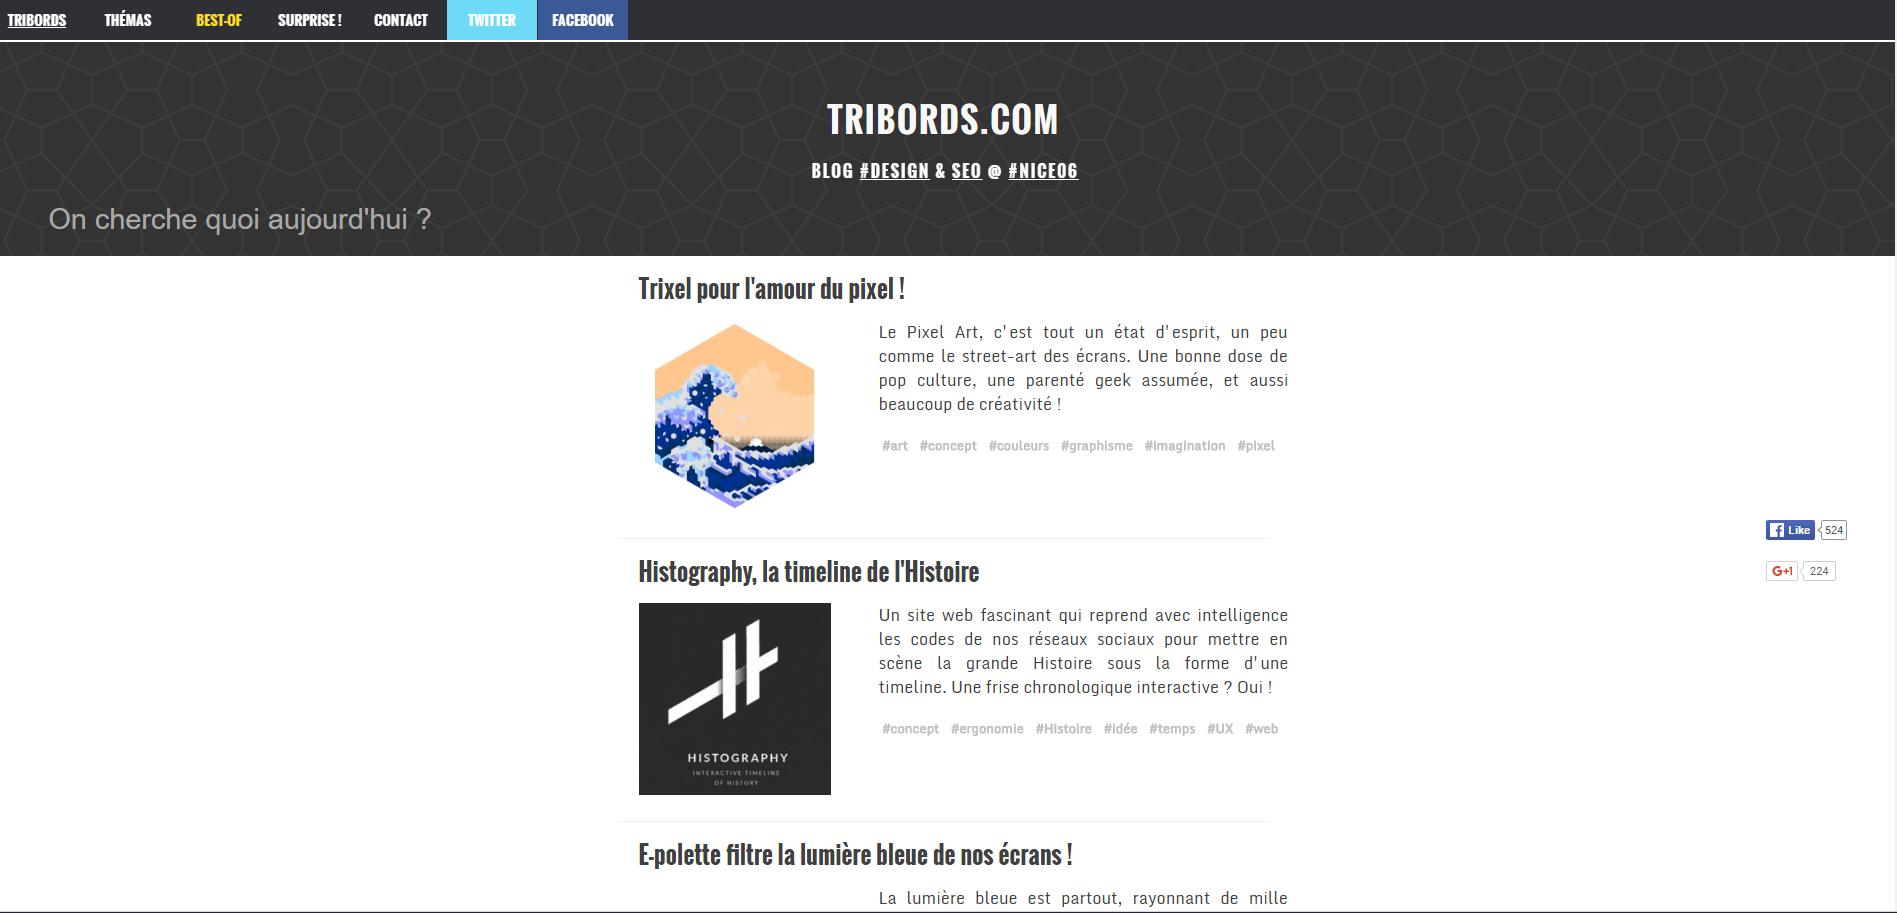 Tribords